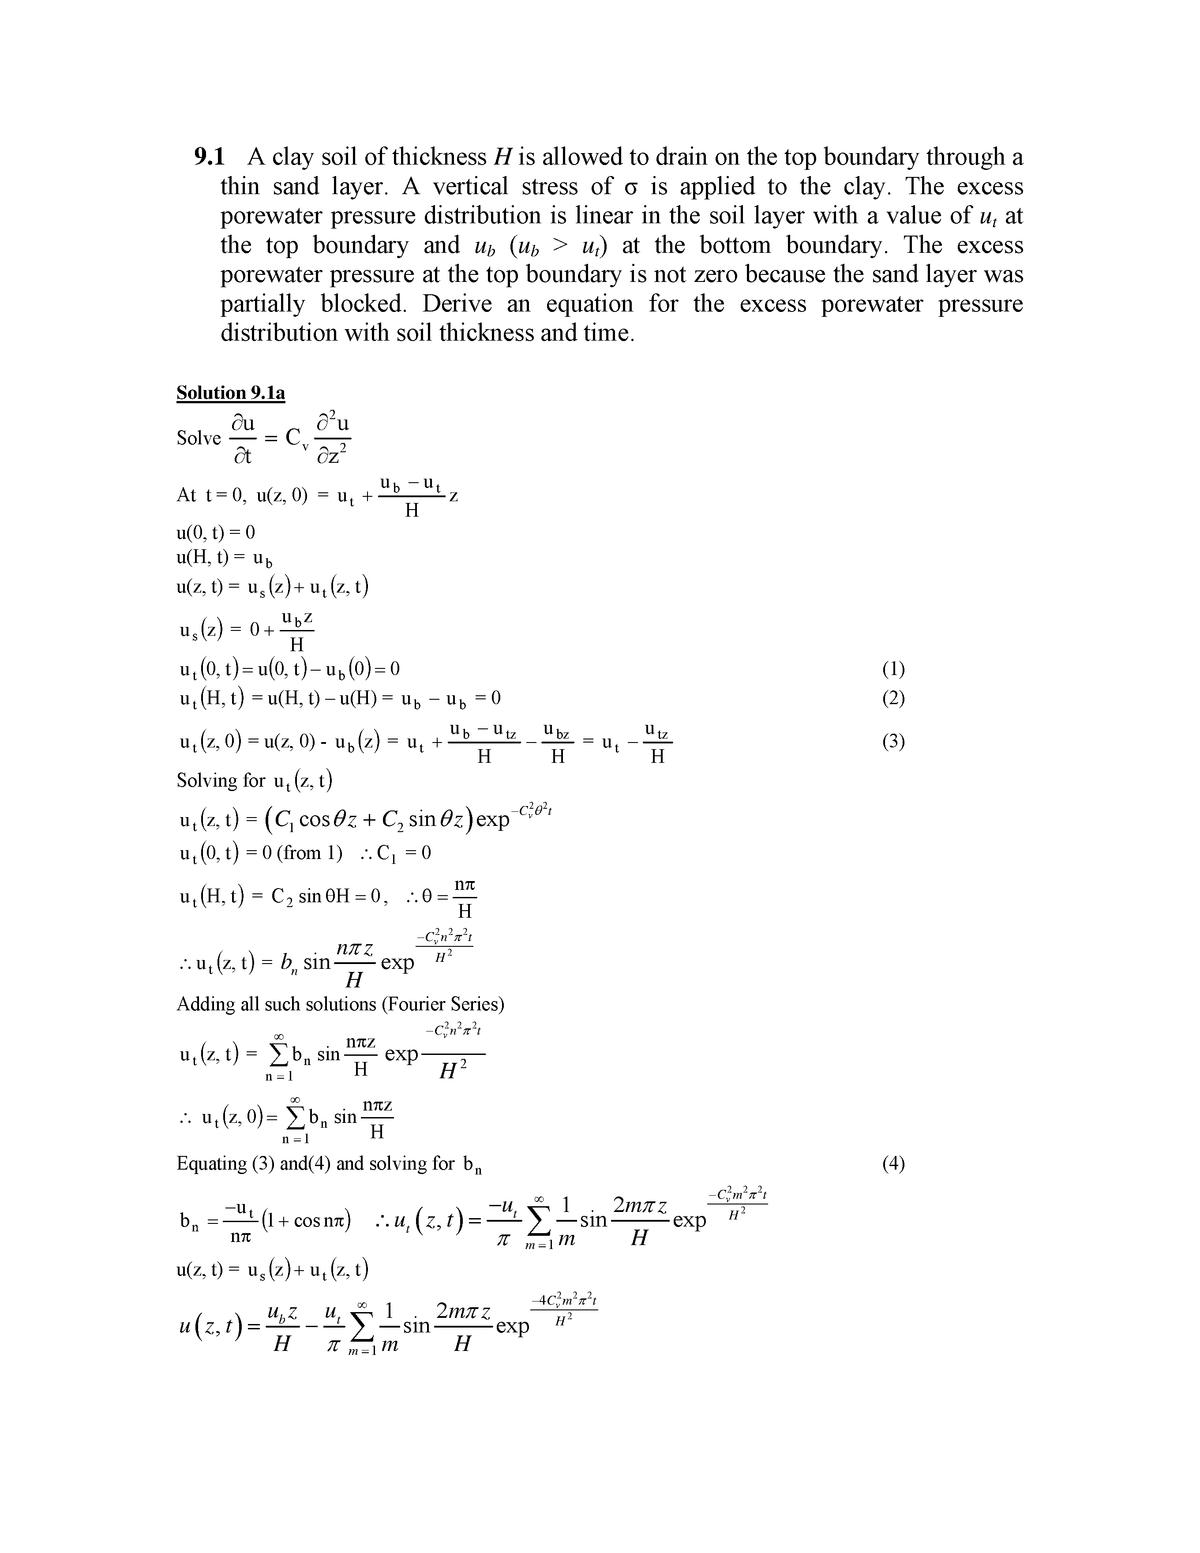 [Book] Budhu Soil Mechanics And Foundations Solutions Manual